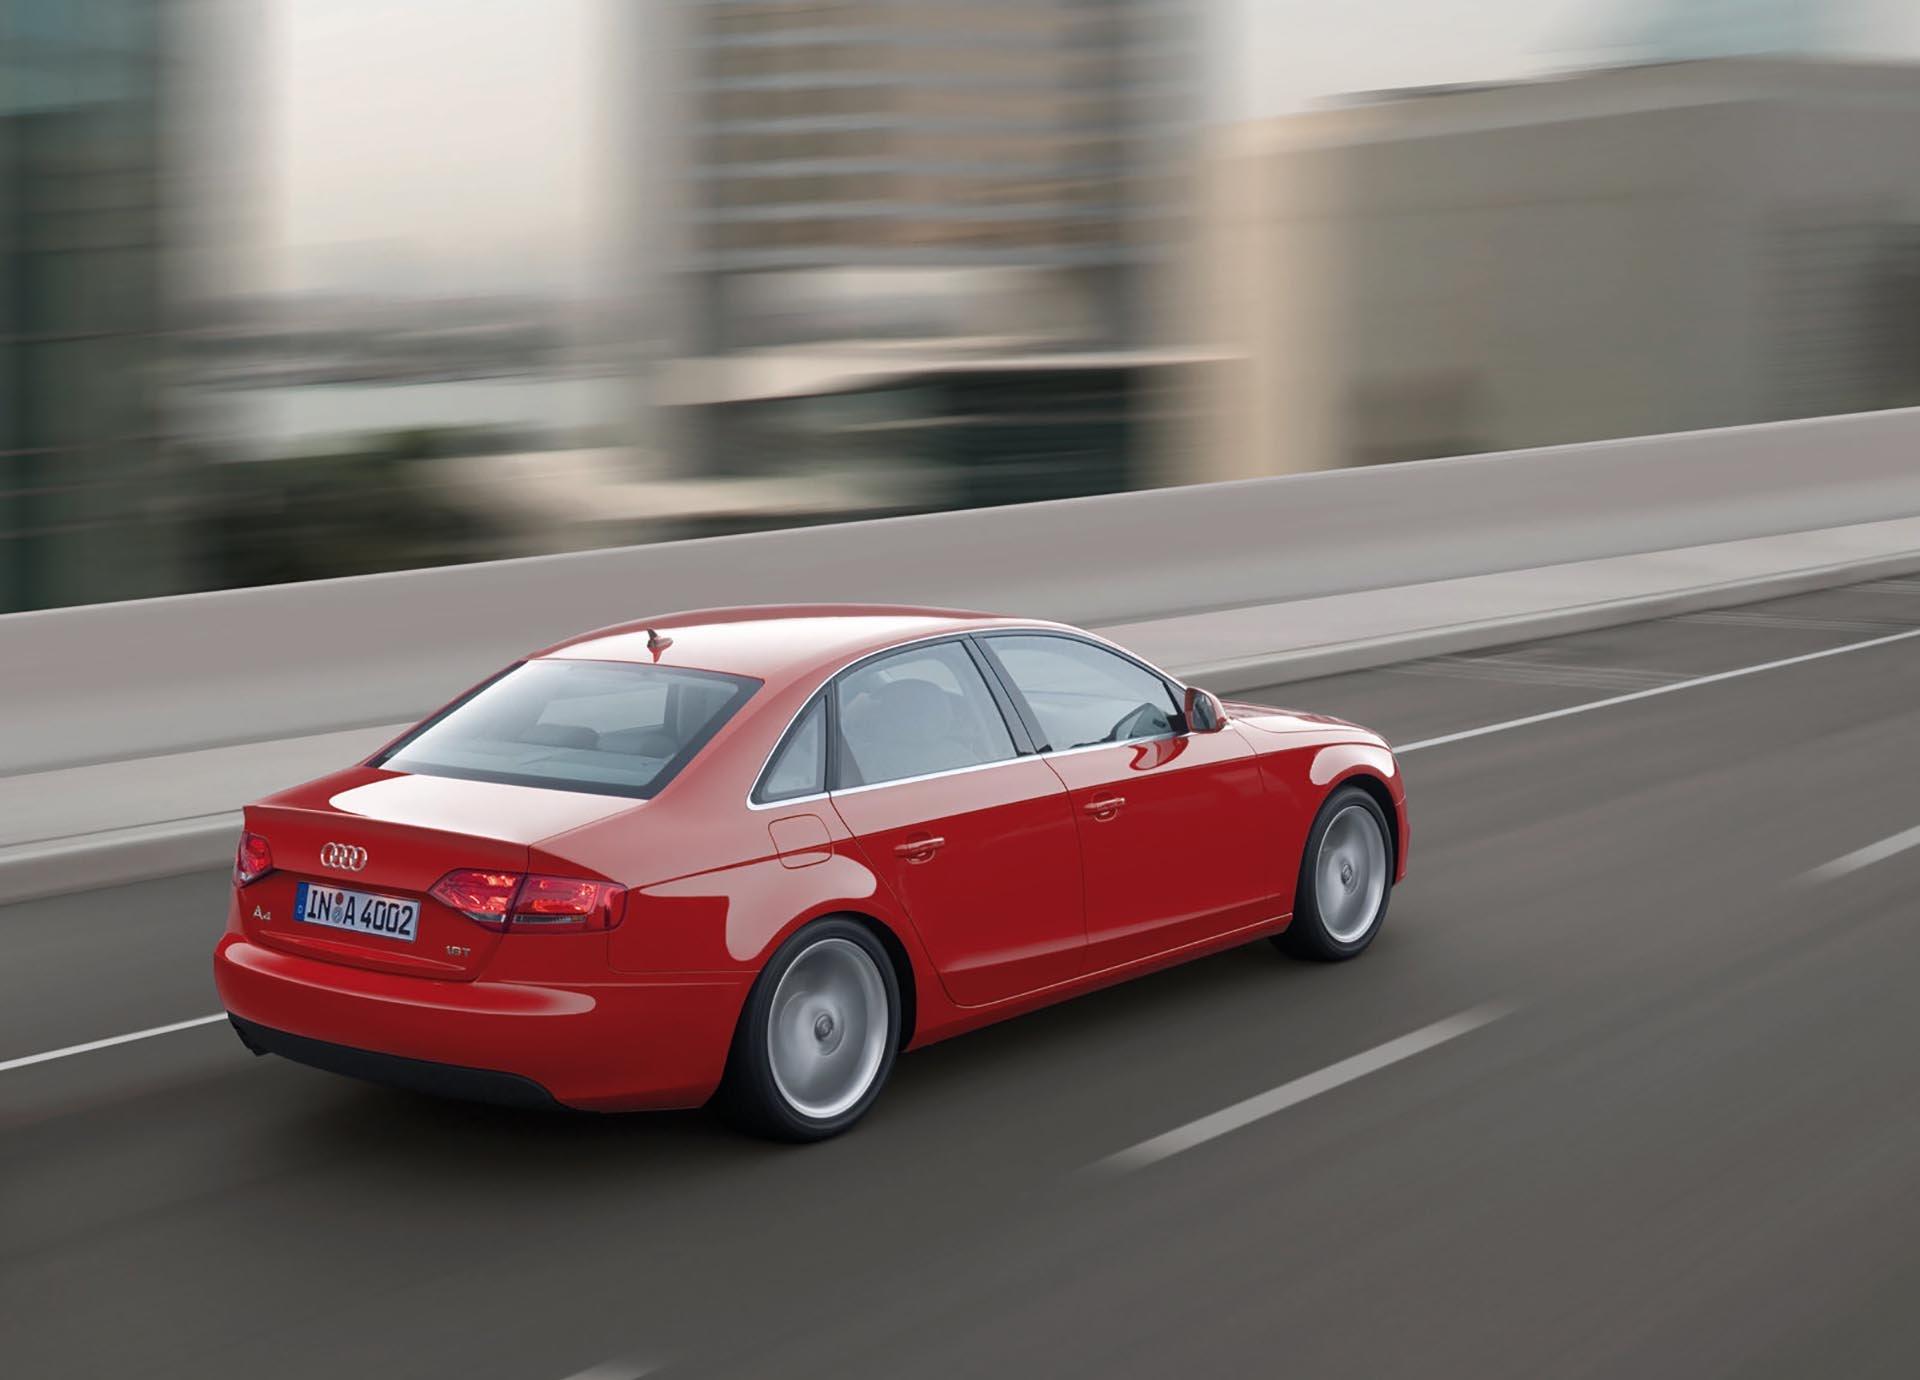 04_B8 Audi A4 rear profile driving